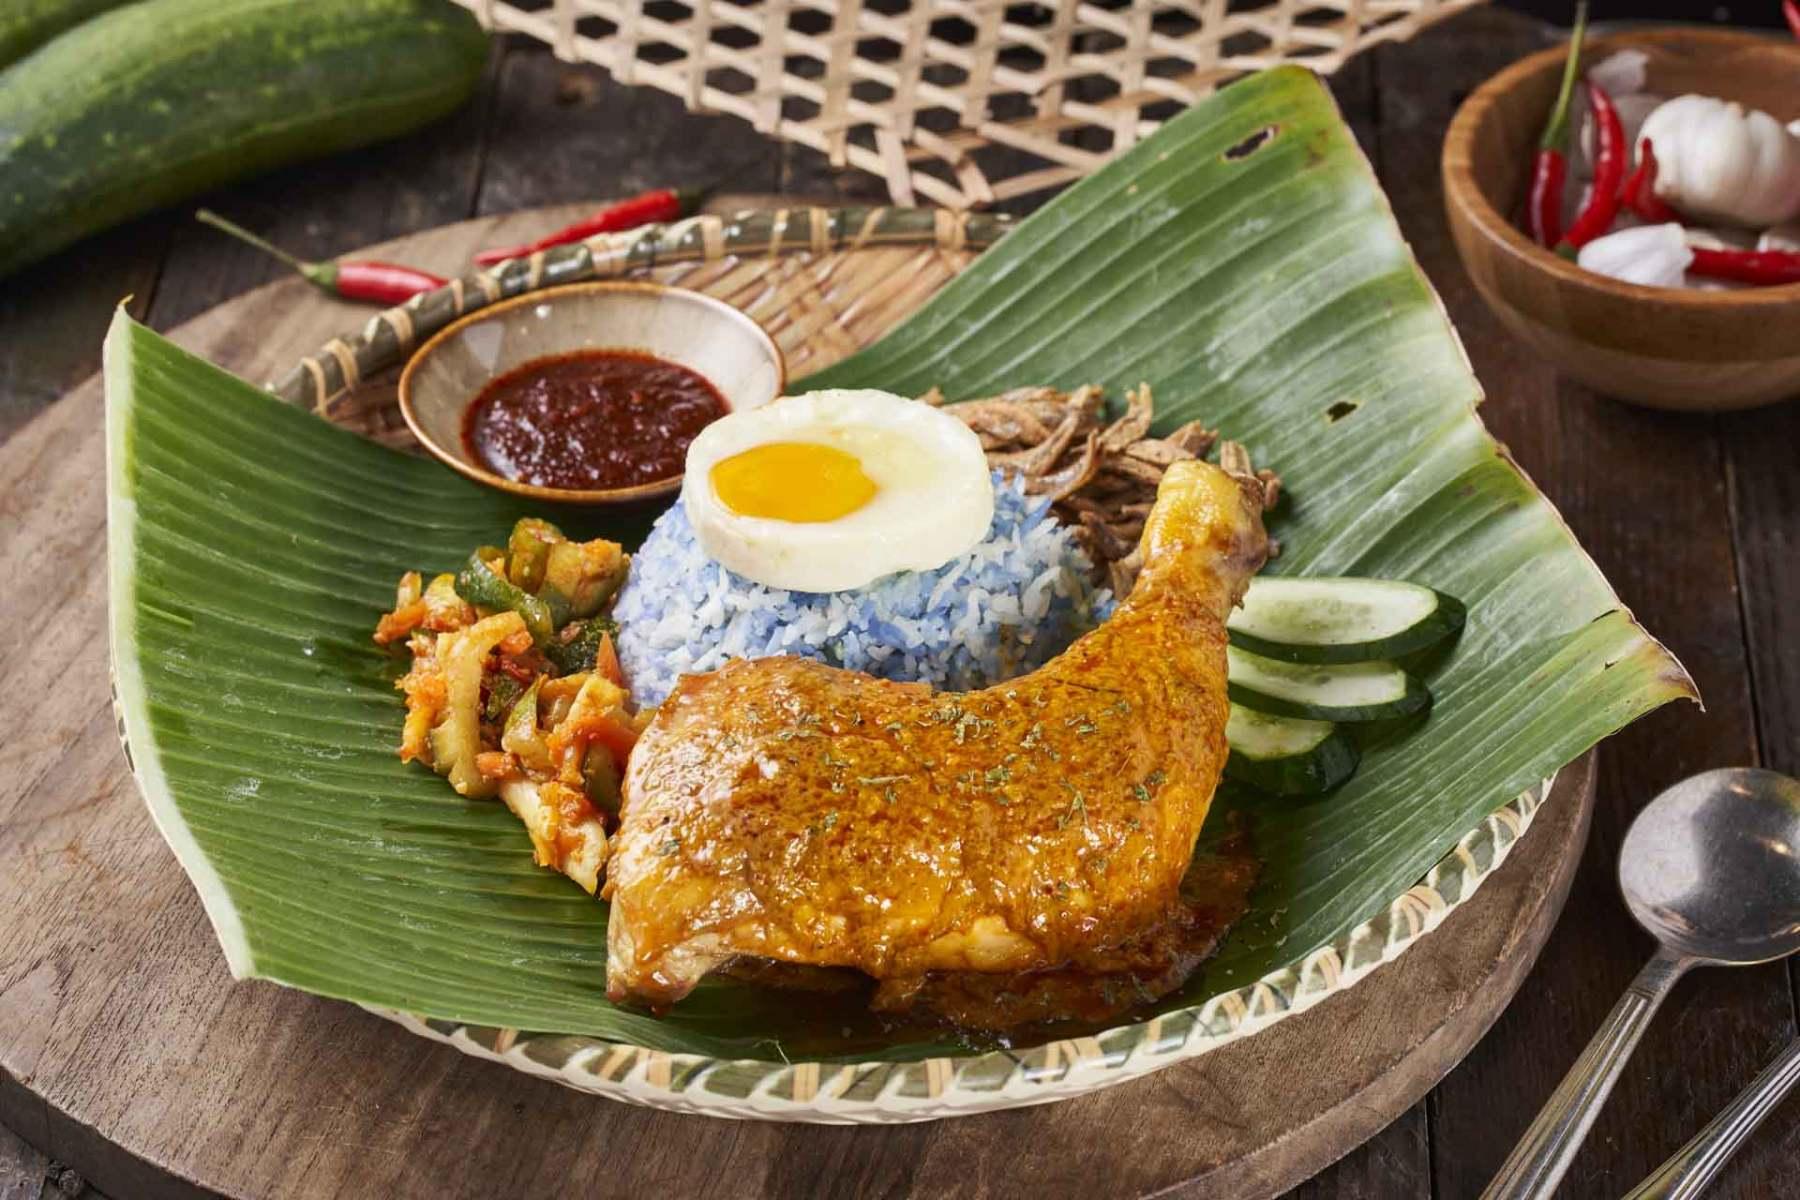 Food-Photography-Singapore-Mixed-Rice-8